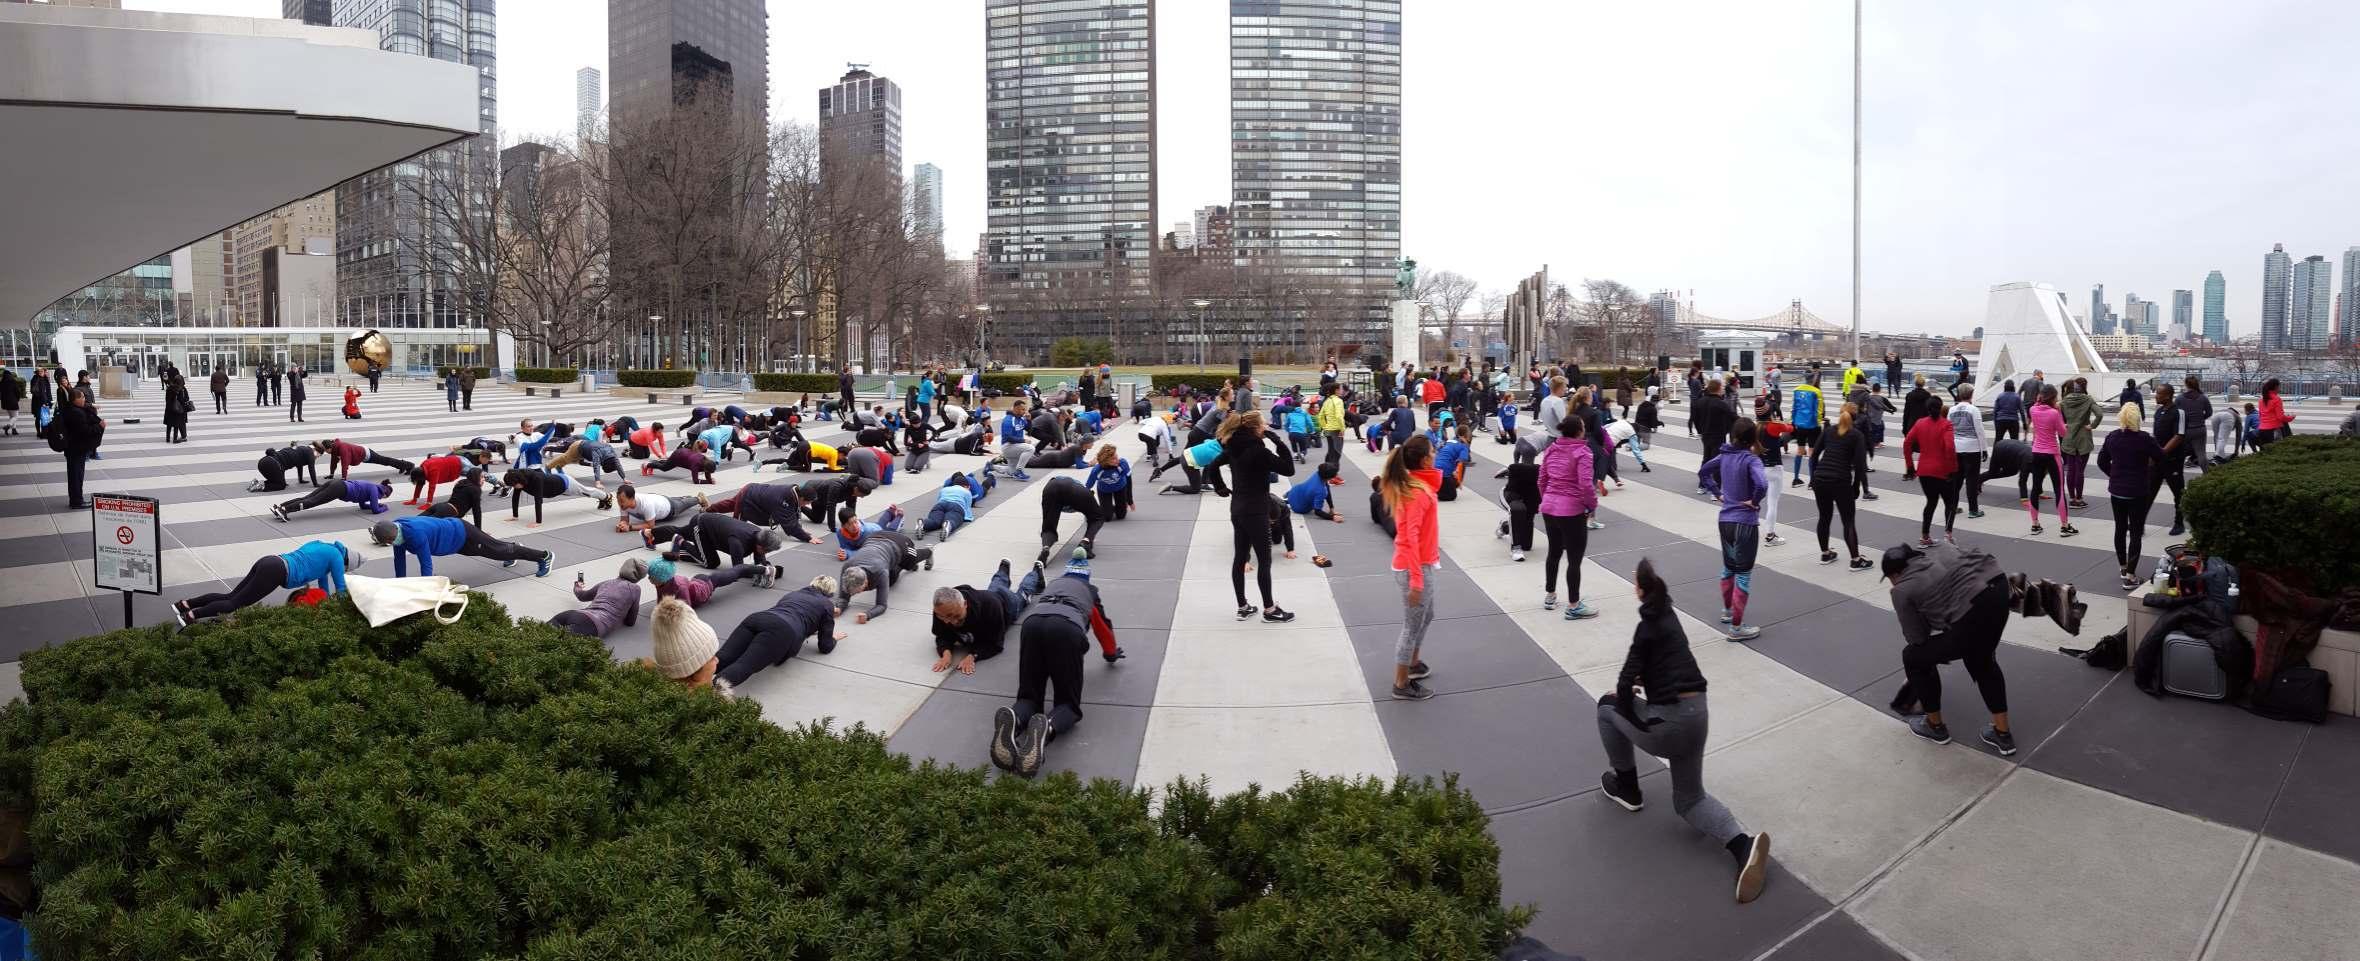 Ironstrength Workout. Photo: DC